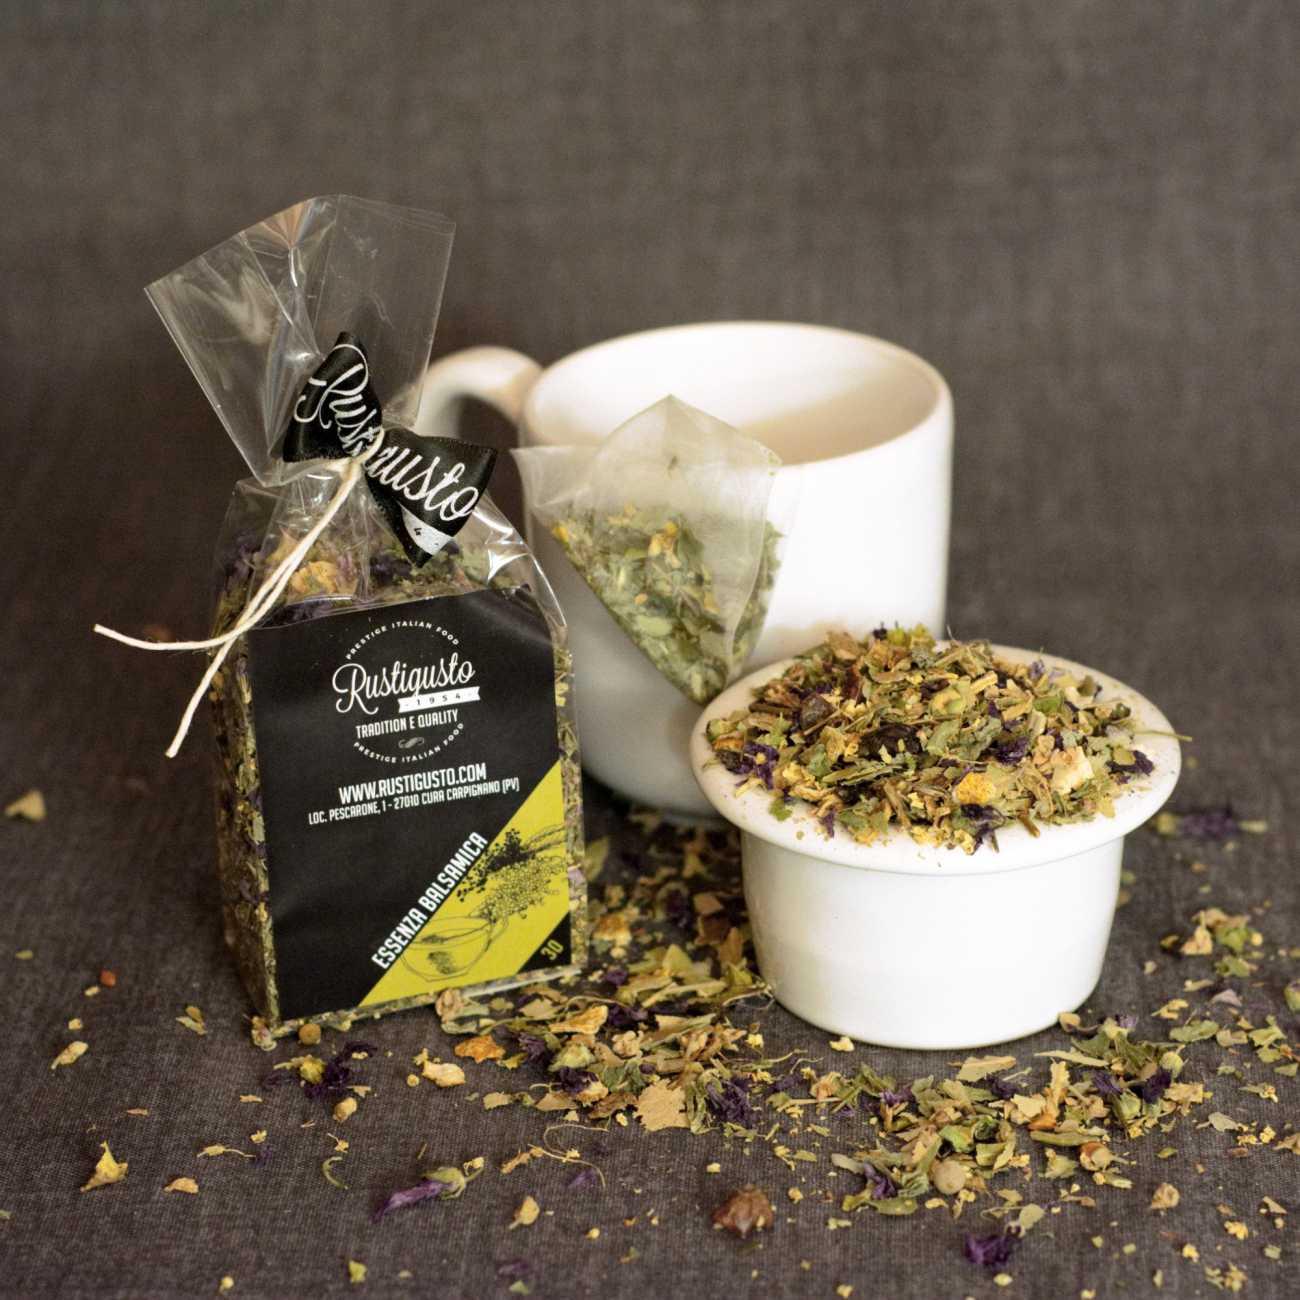 Balsamic herb tea - Coffee and herbal teas